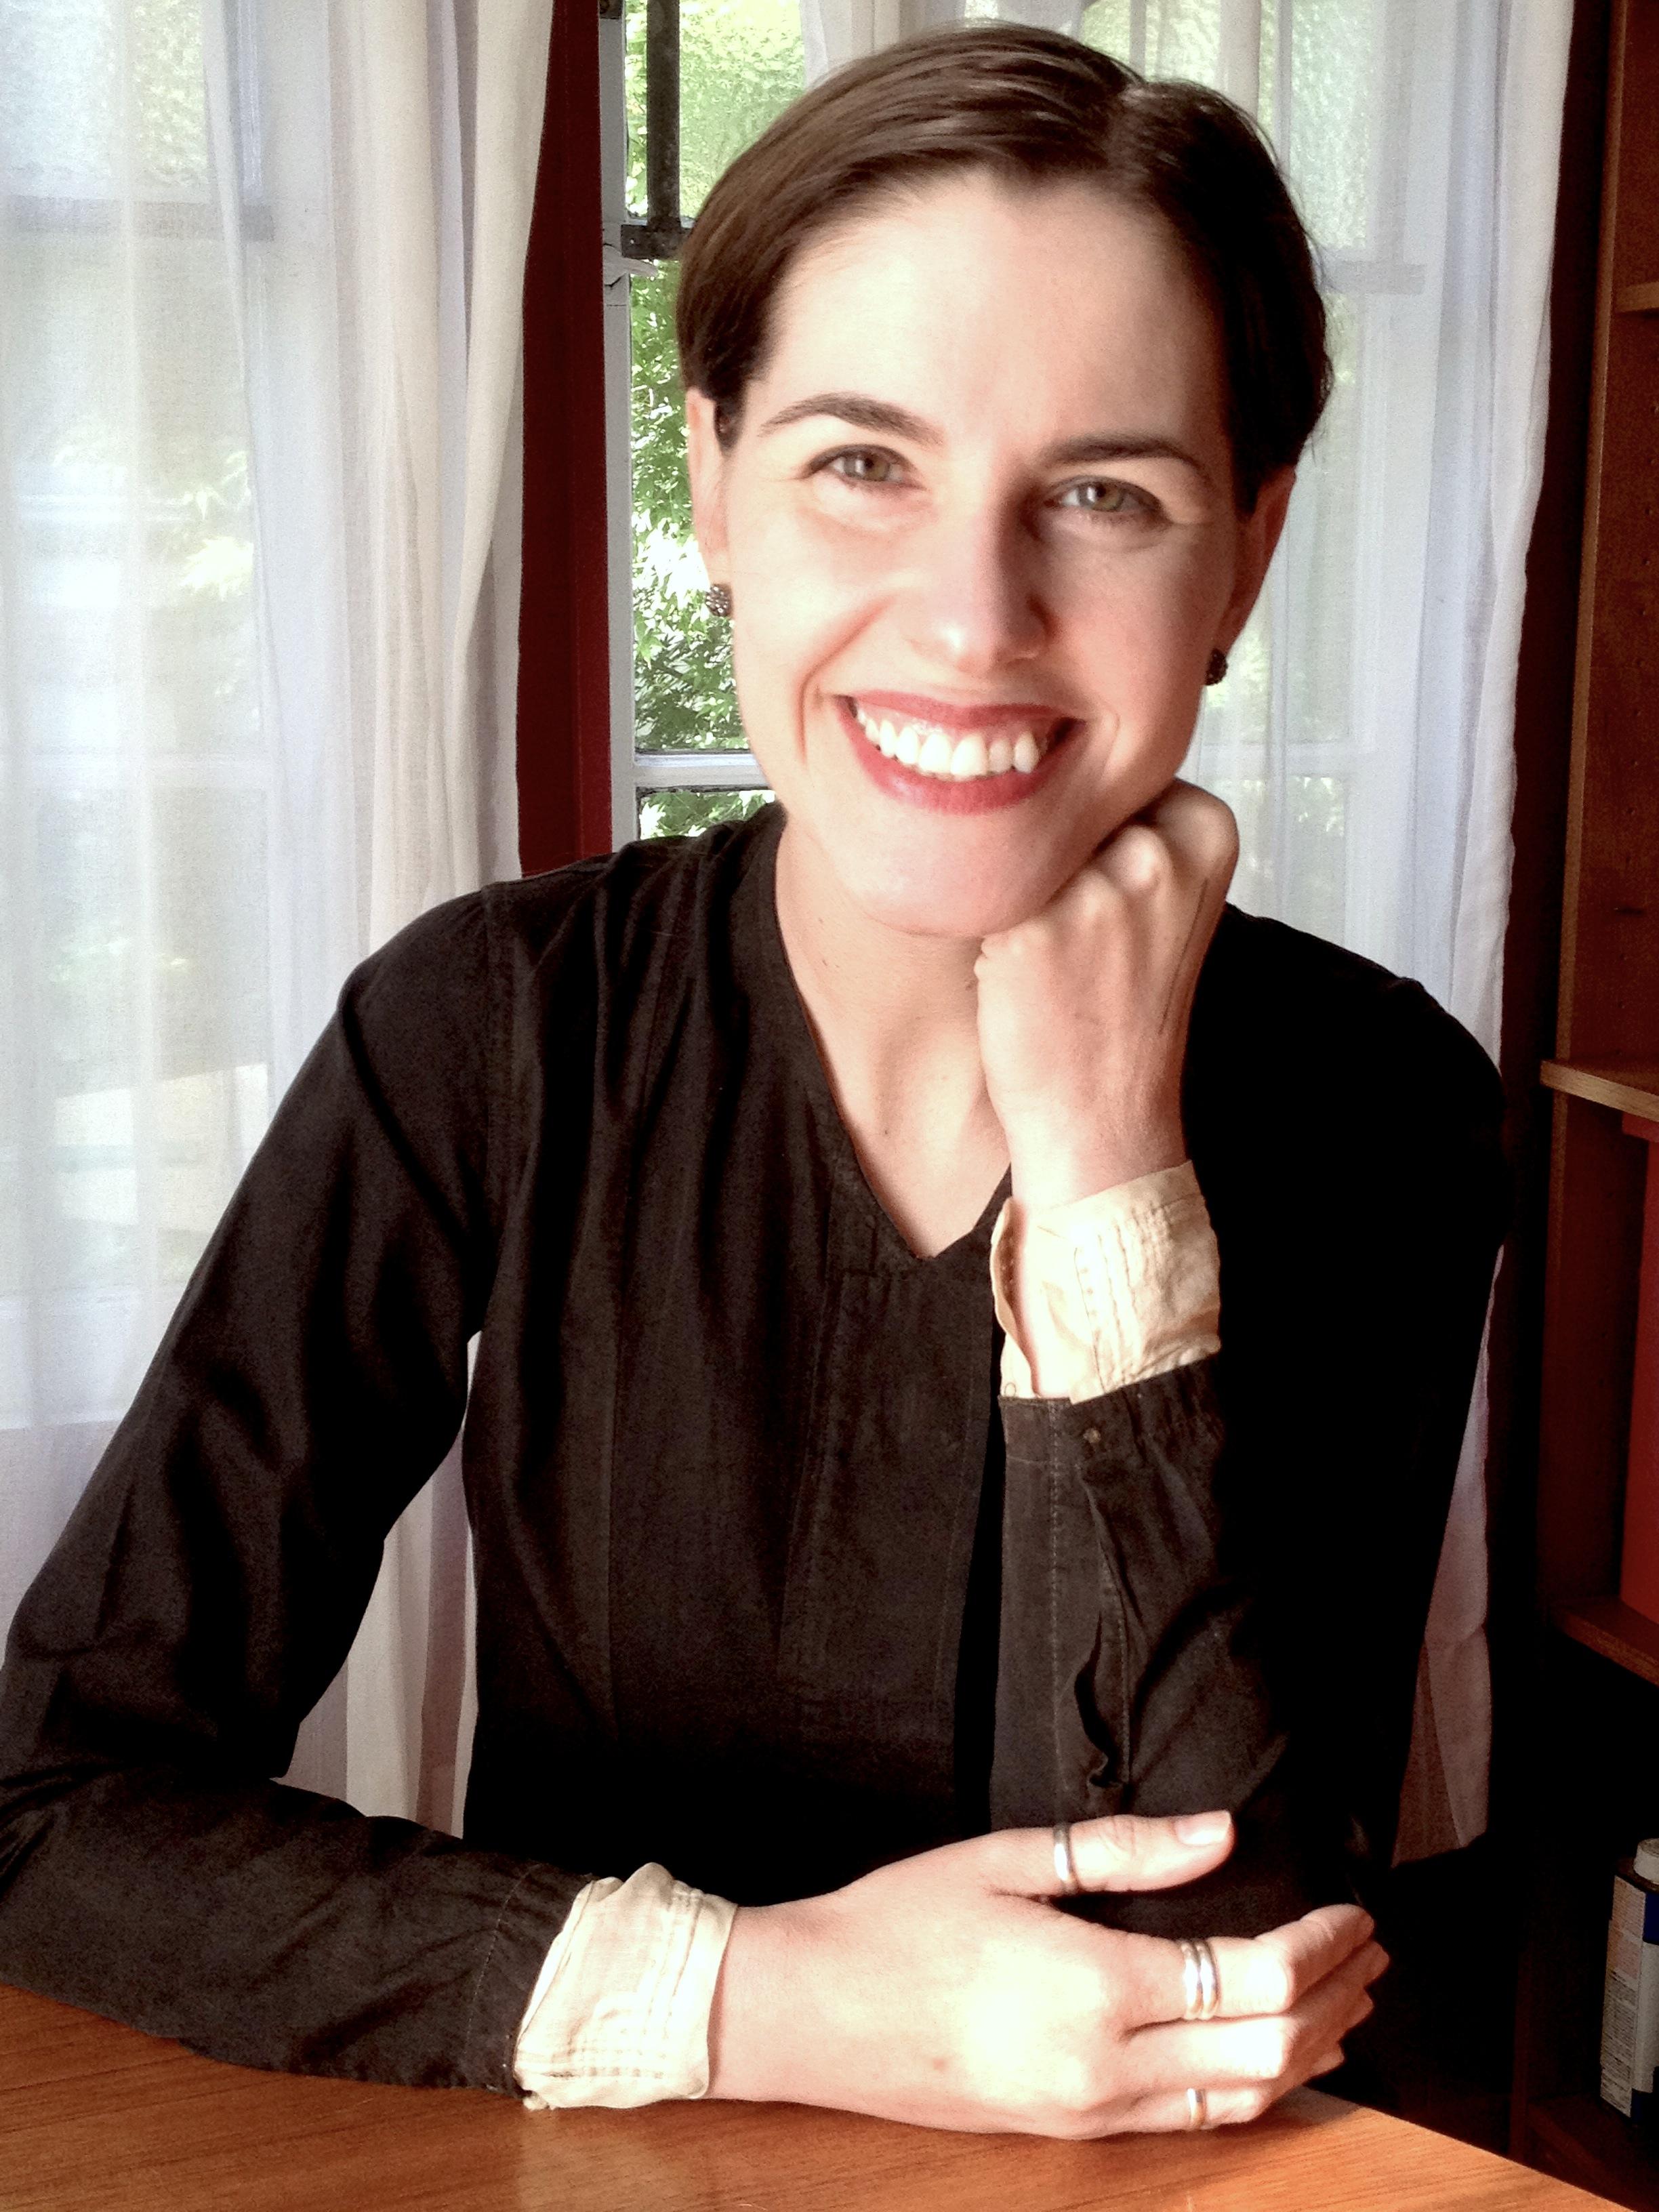 Prof. Julia Bryan-Wilson